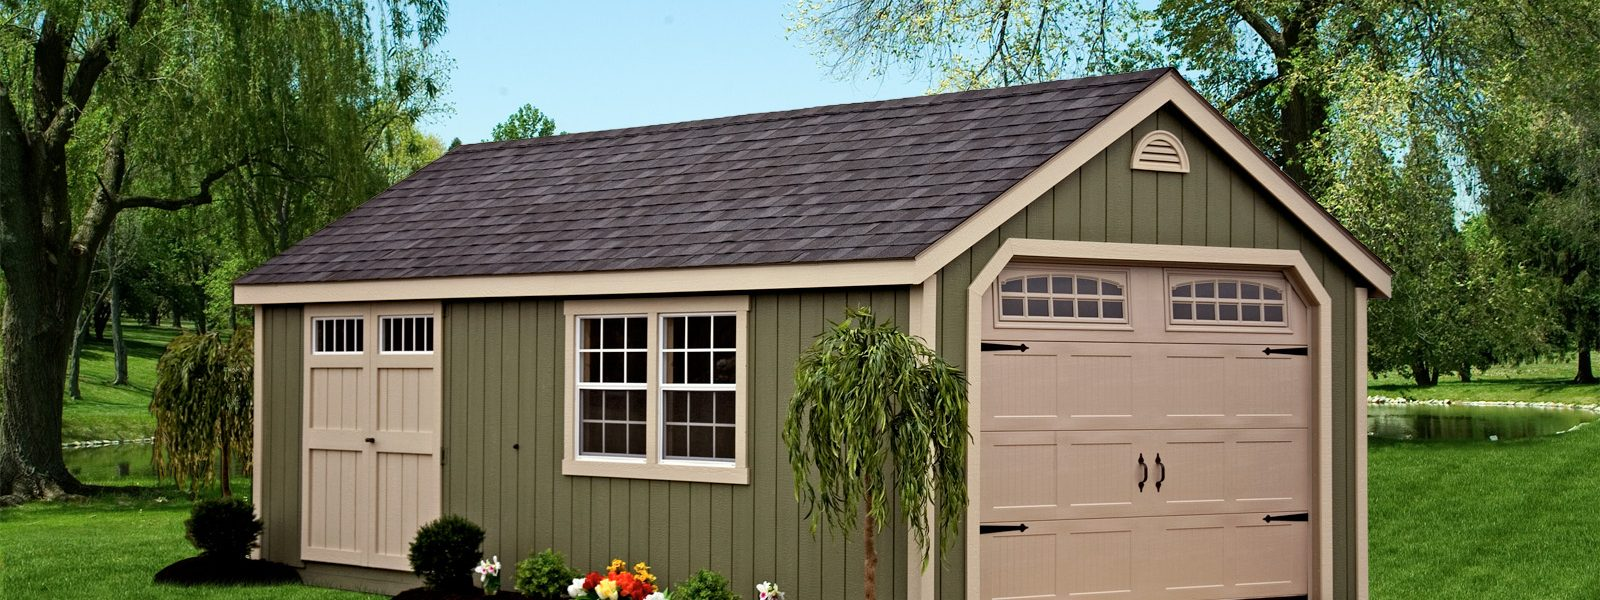 Prefab Garages Amish Made Prefab Garages For Sale Cape Cod Garage